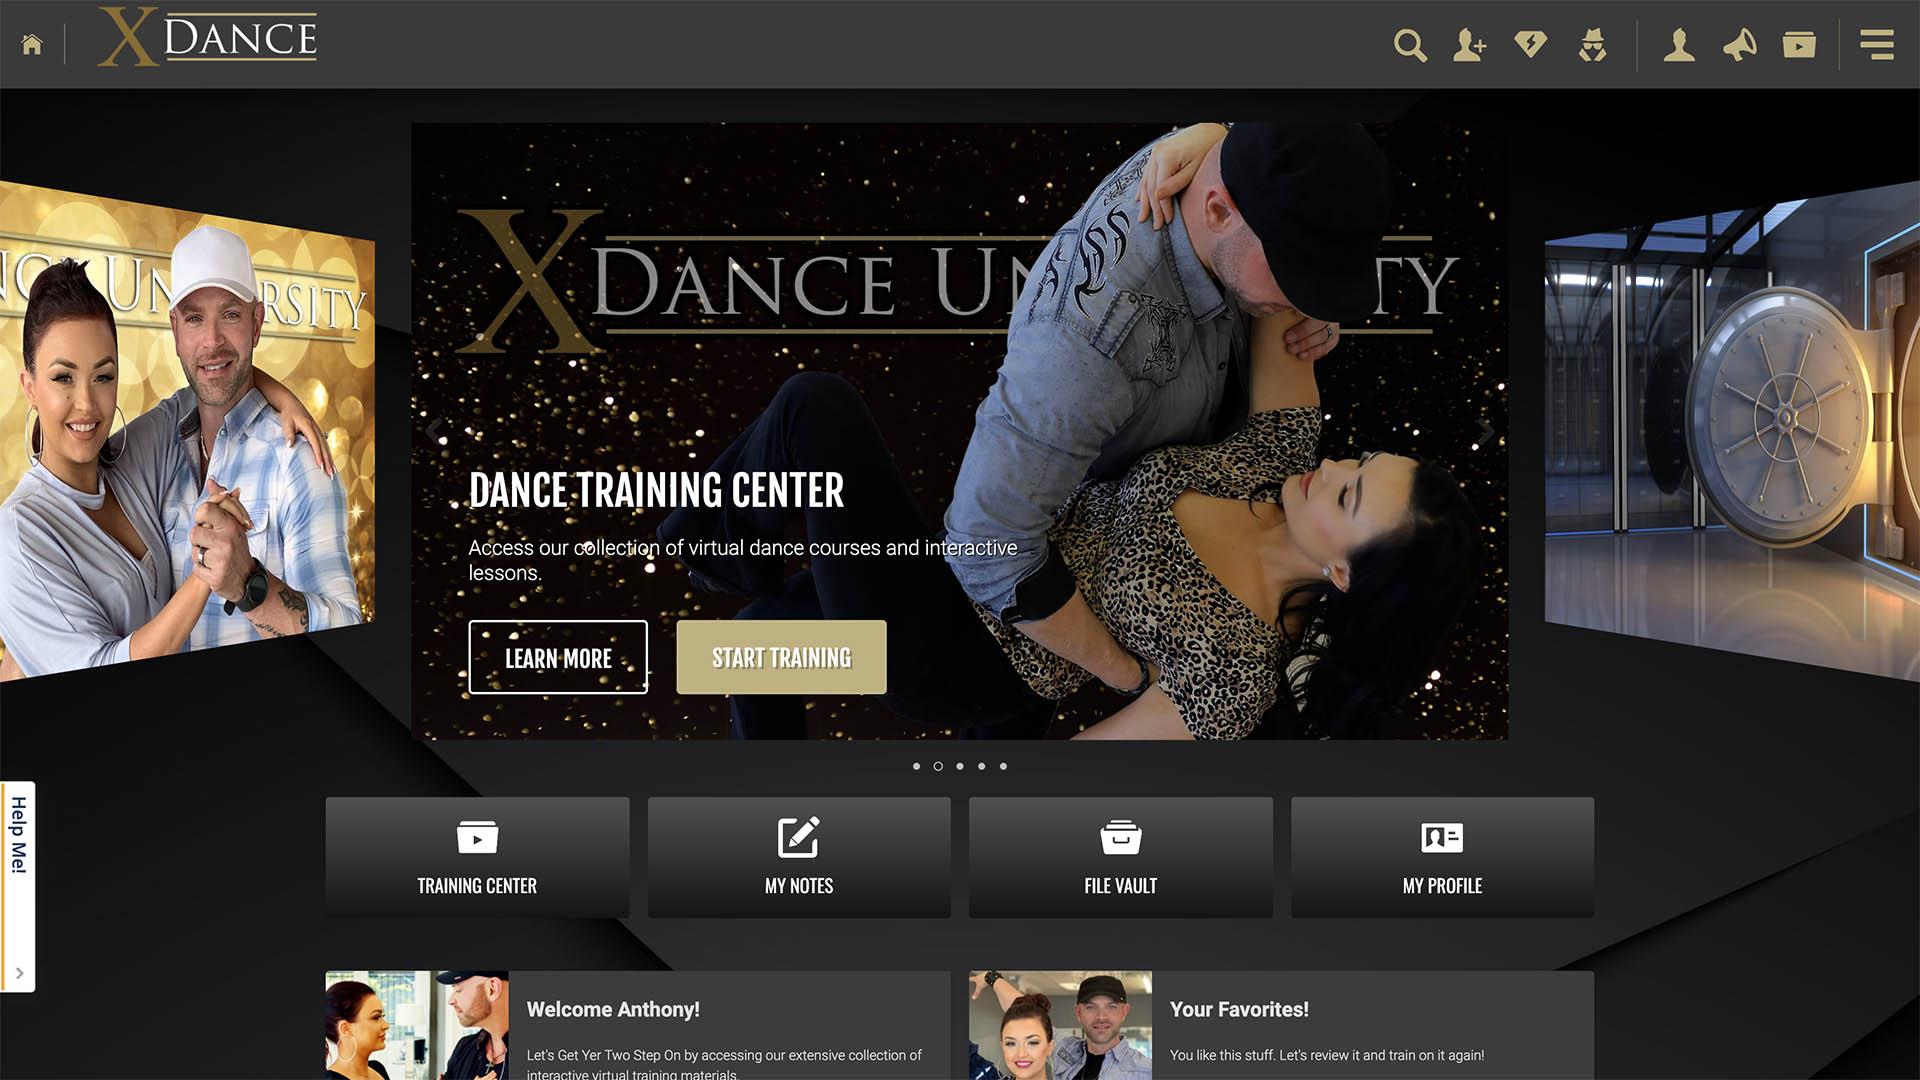 X Dance Tour